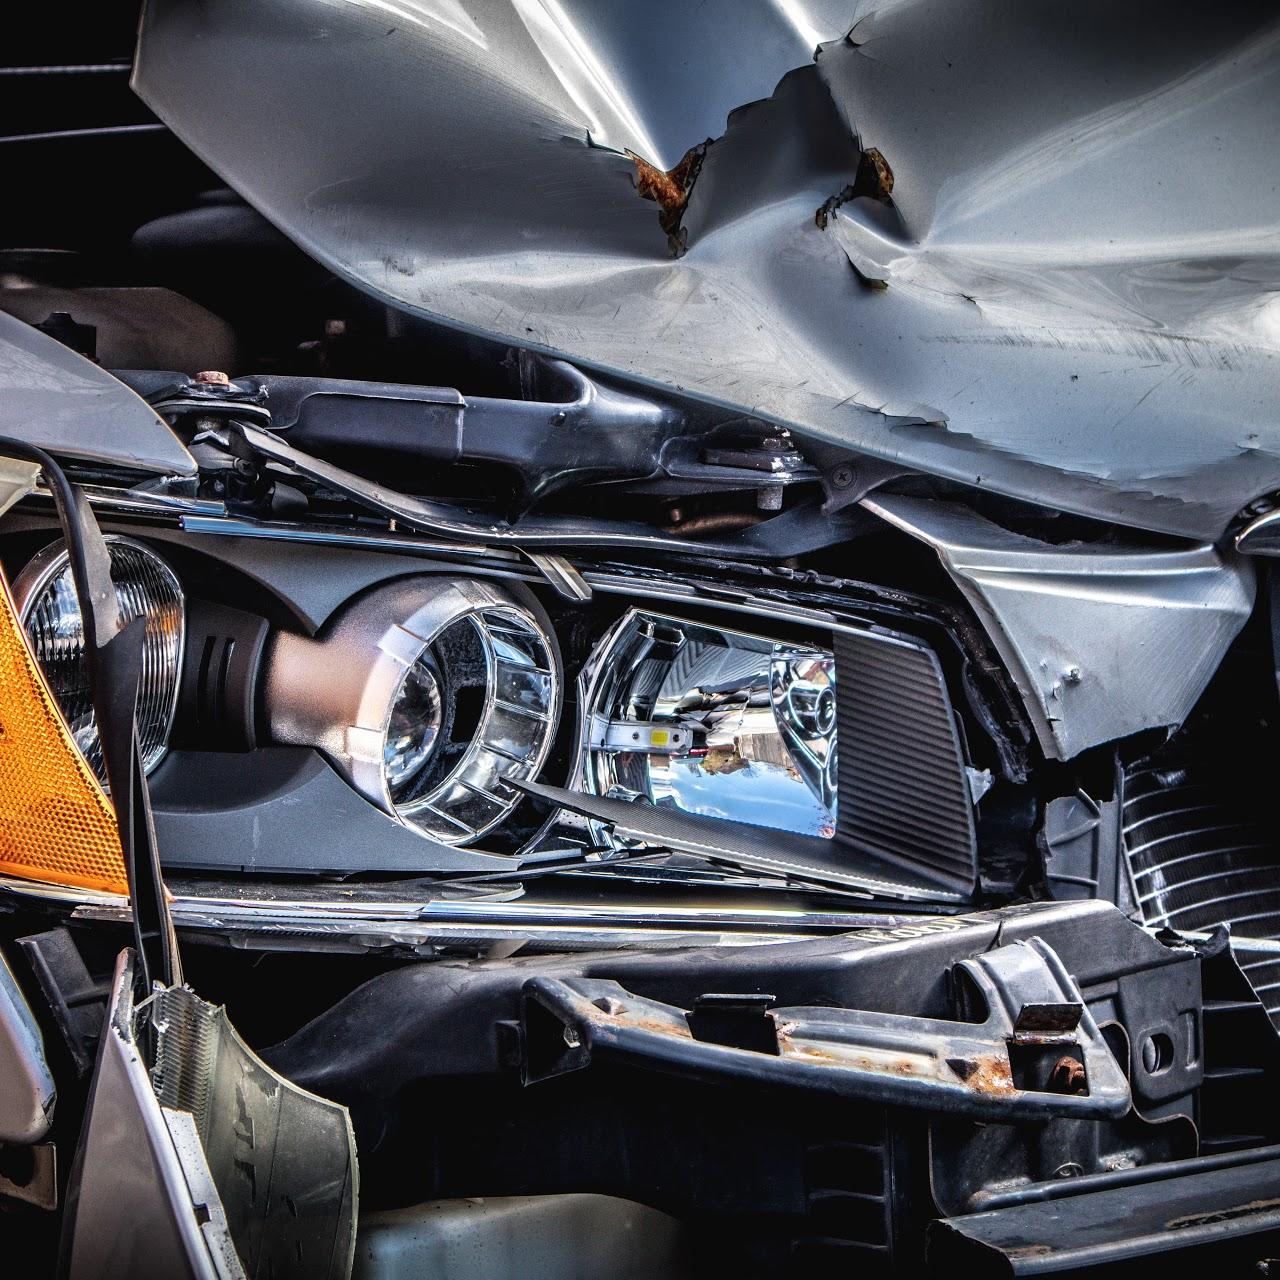 Hit & Run Car Accidents